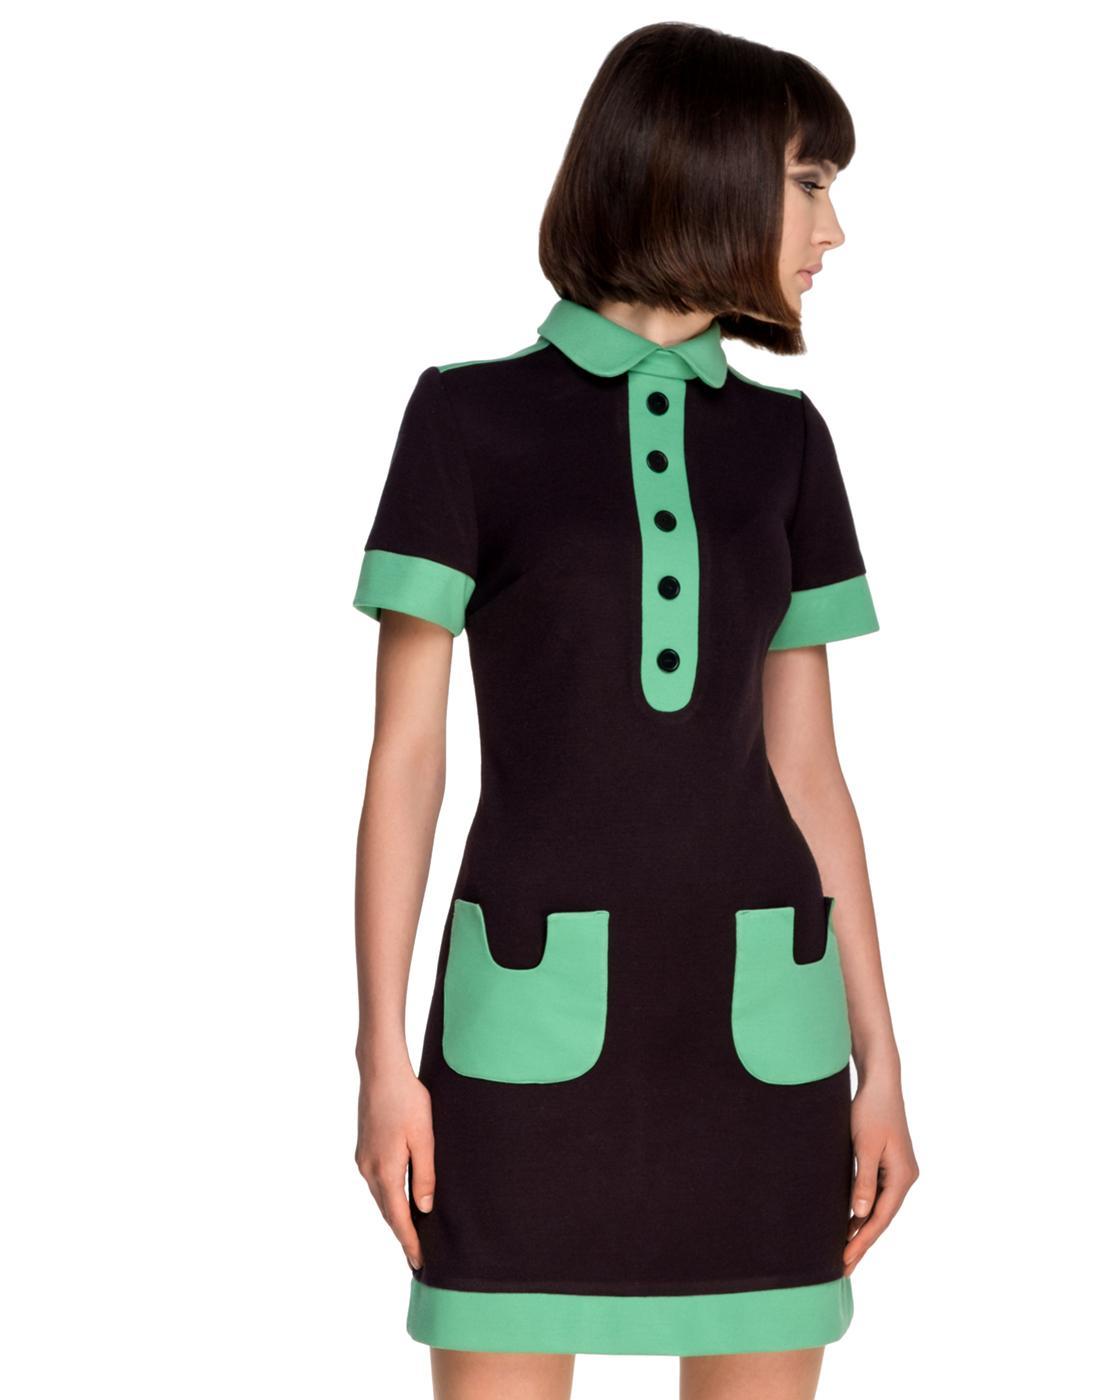 MARMALADE 1960s Mod Contrast Pocket Polo Dress B/G